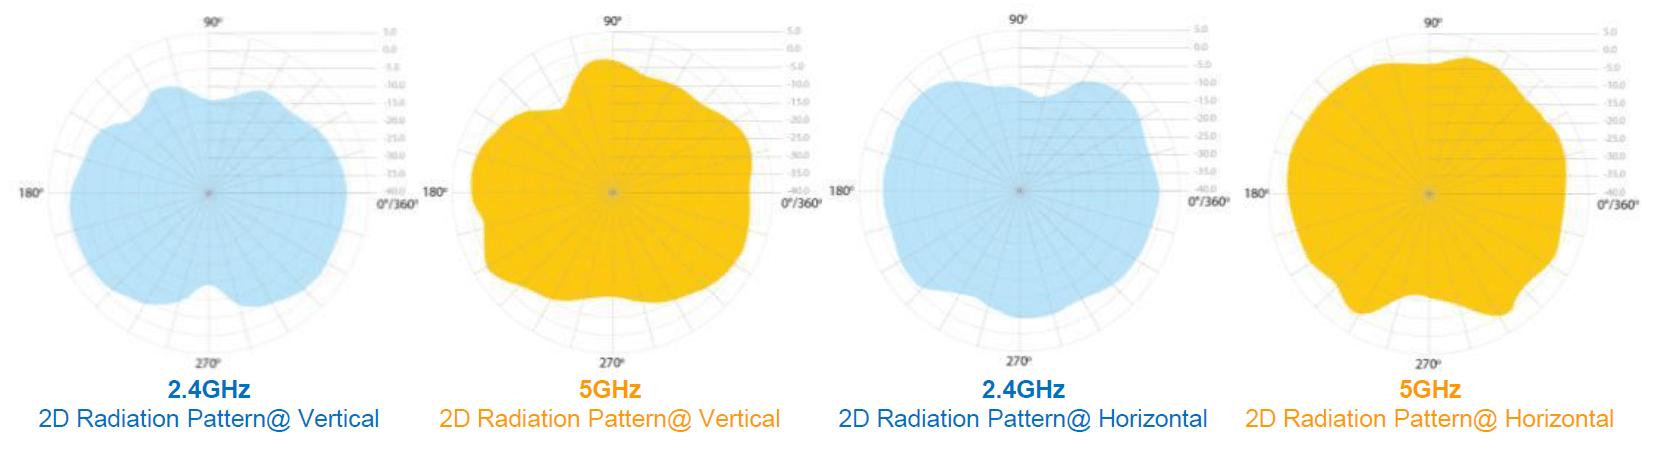 AP55-Radiation-Pattern